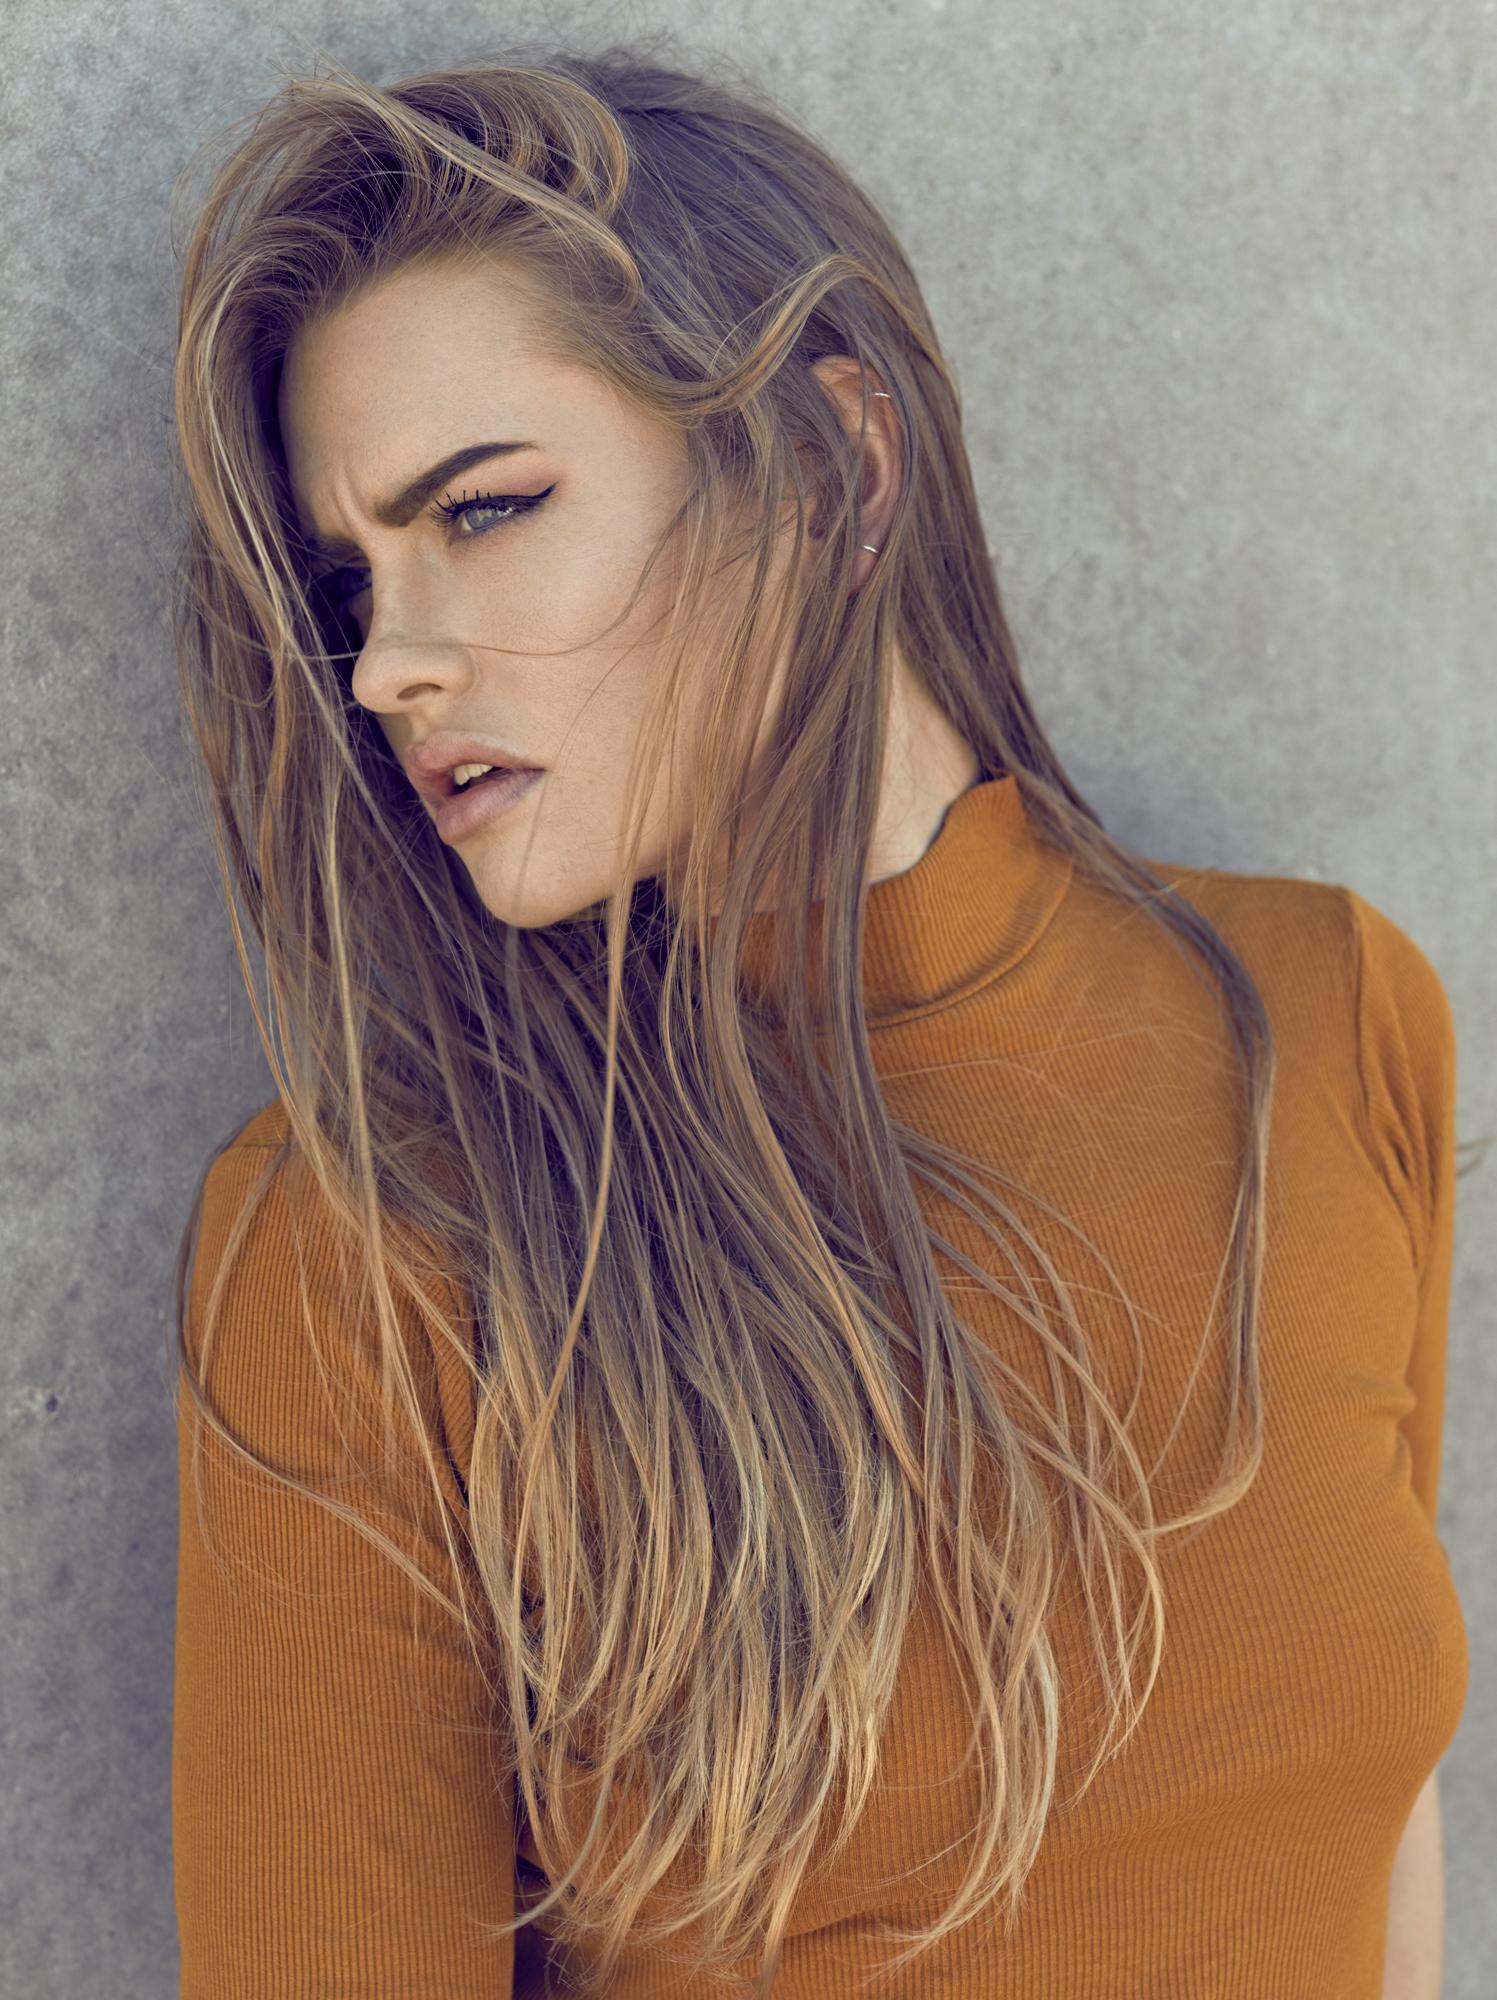 Cecilia Patricia Hyldedahl Refsgaard fotograf christian grüner gul trøje langt hår beton